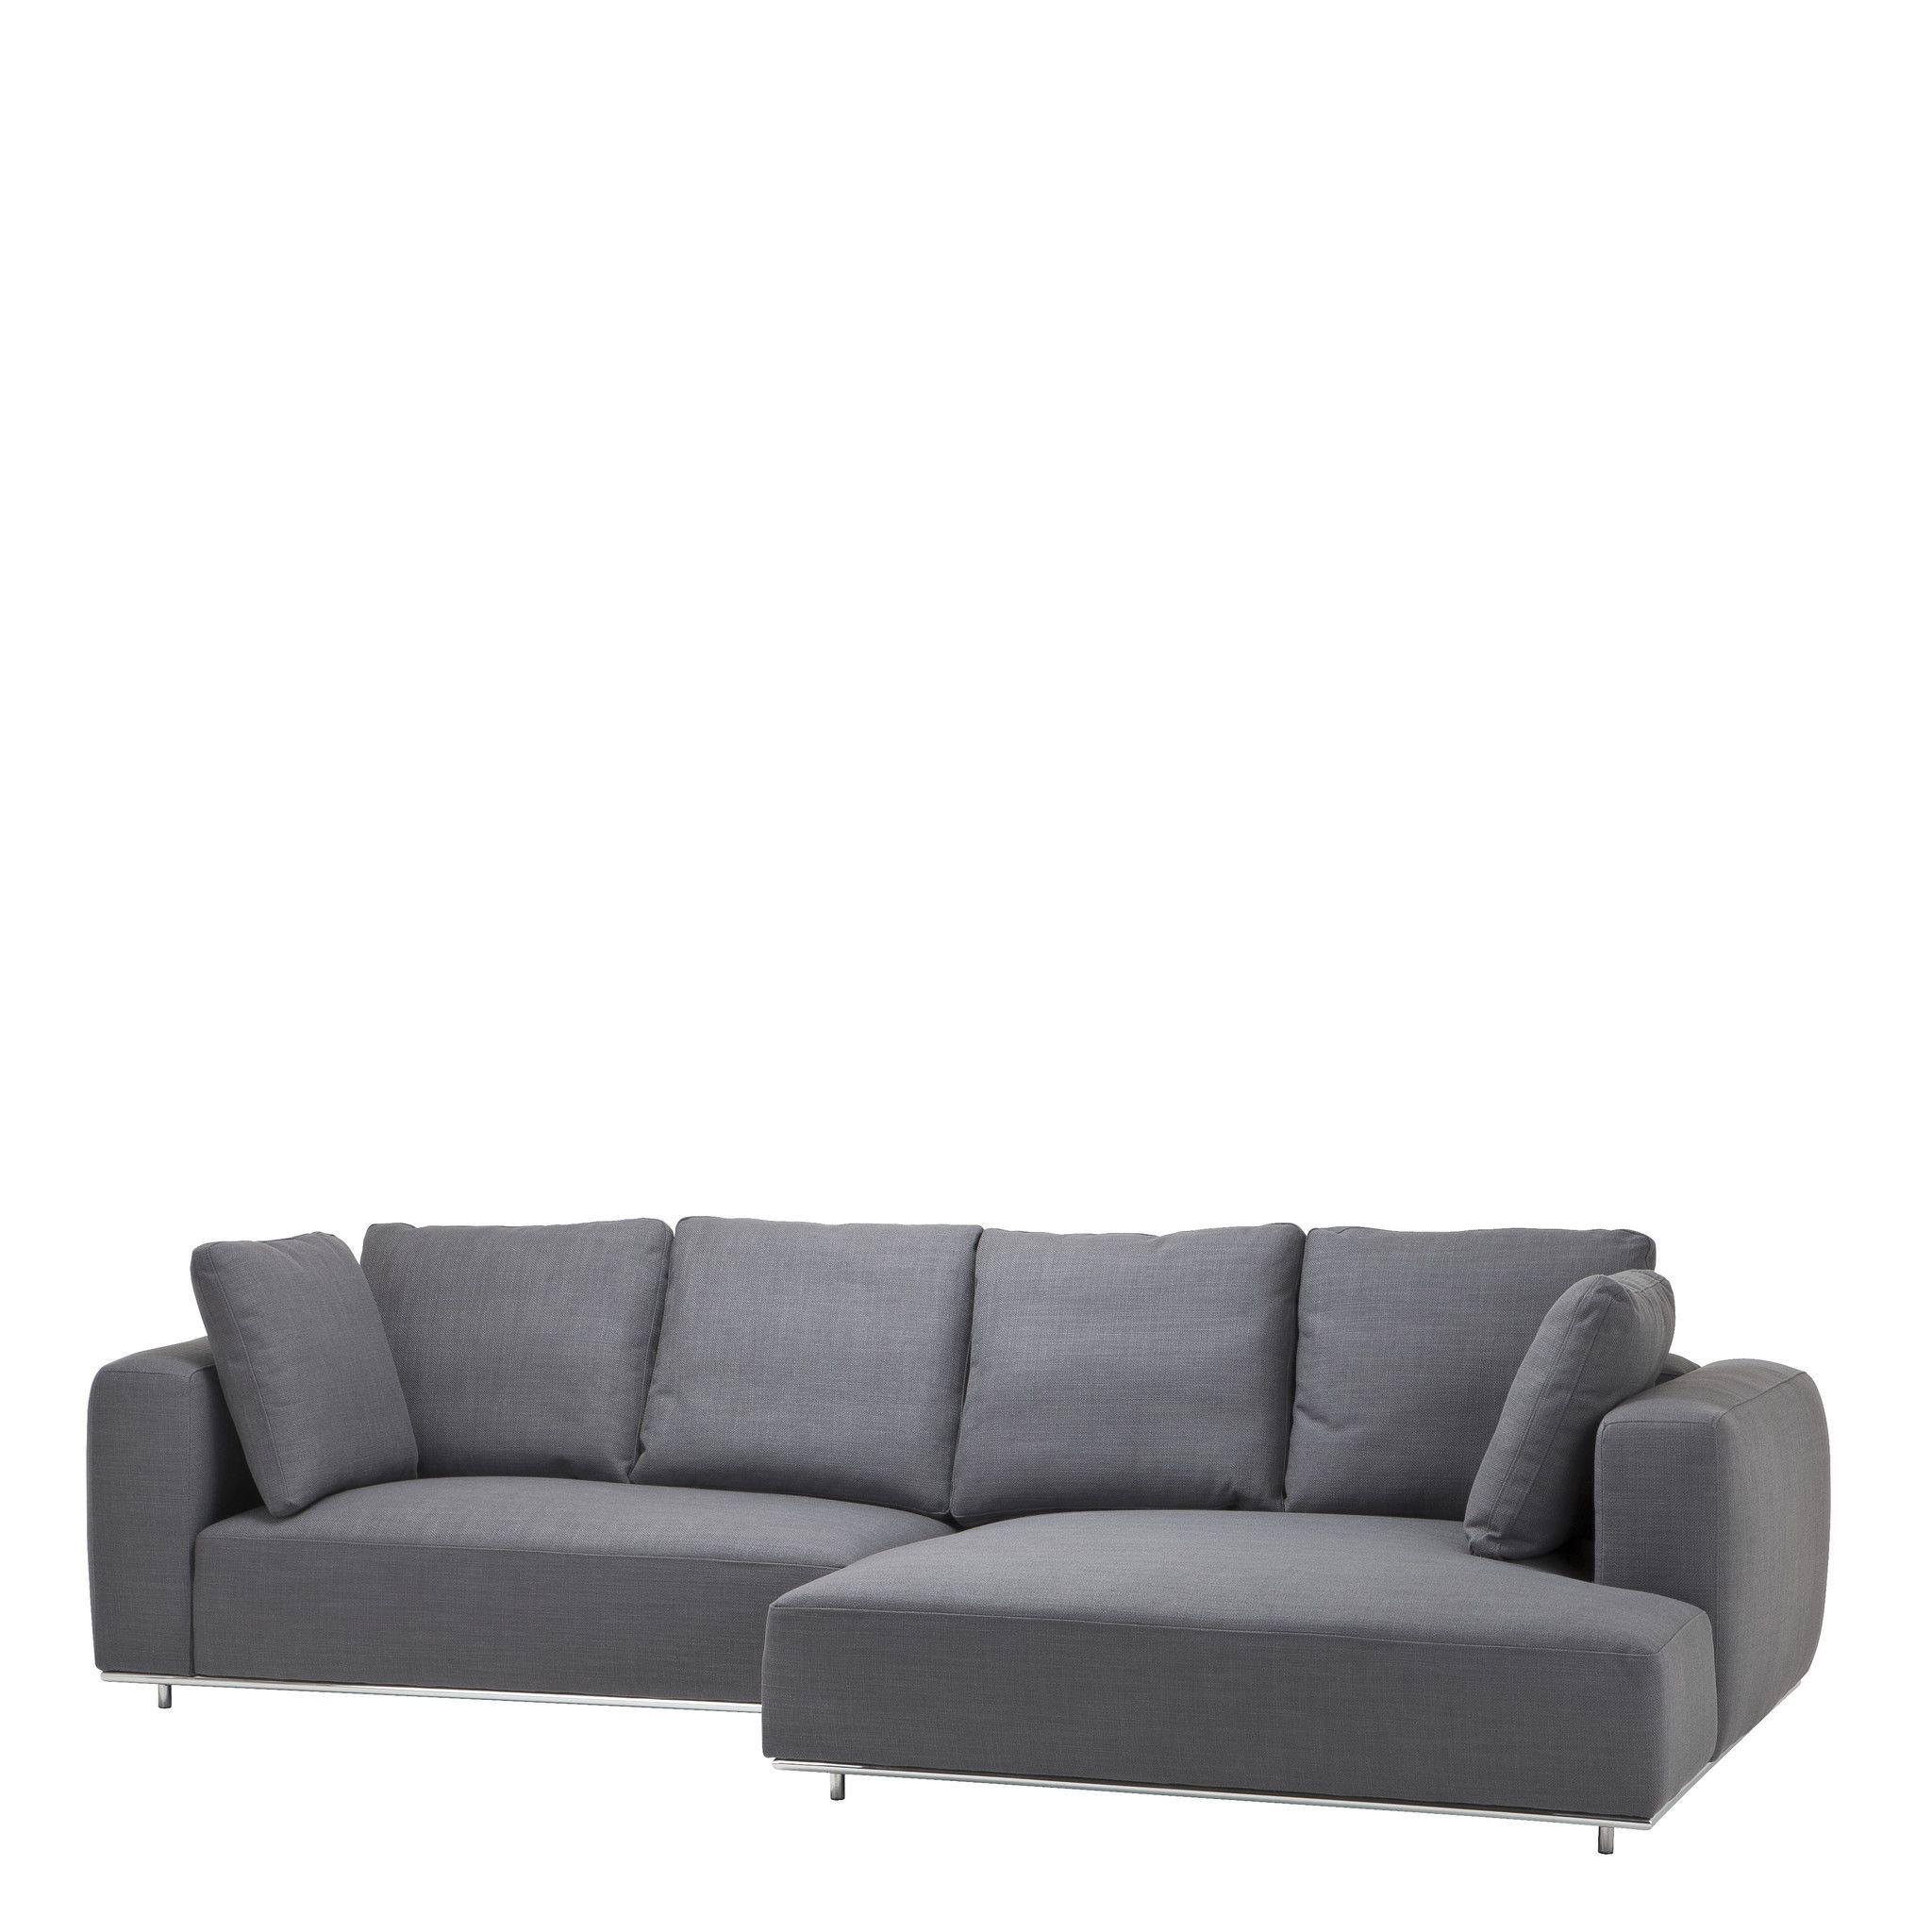 Gray Sofa Eichholtz Colorado Products ~ White Leather L Shaped Sofa